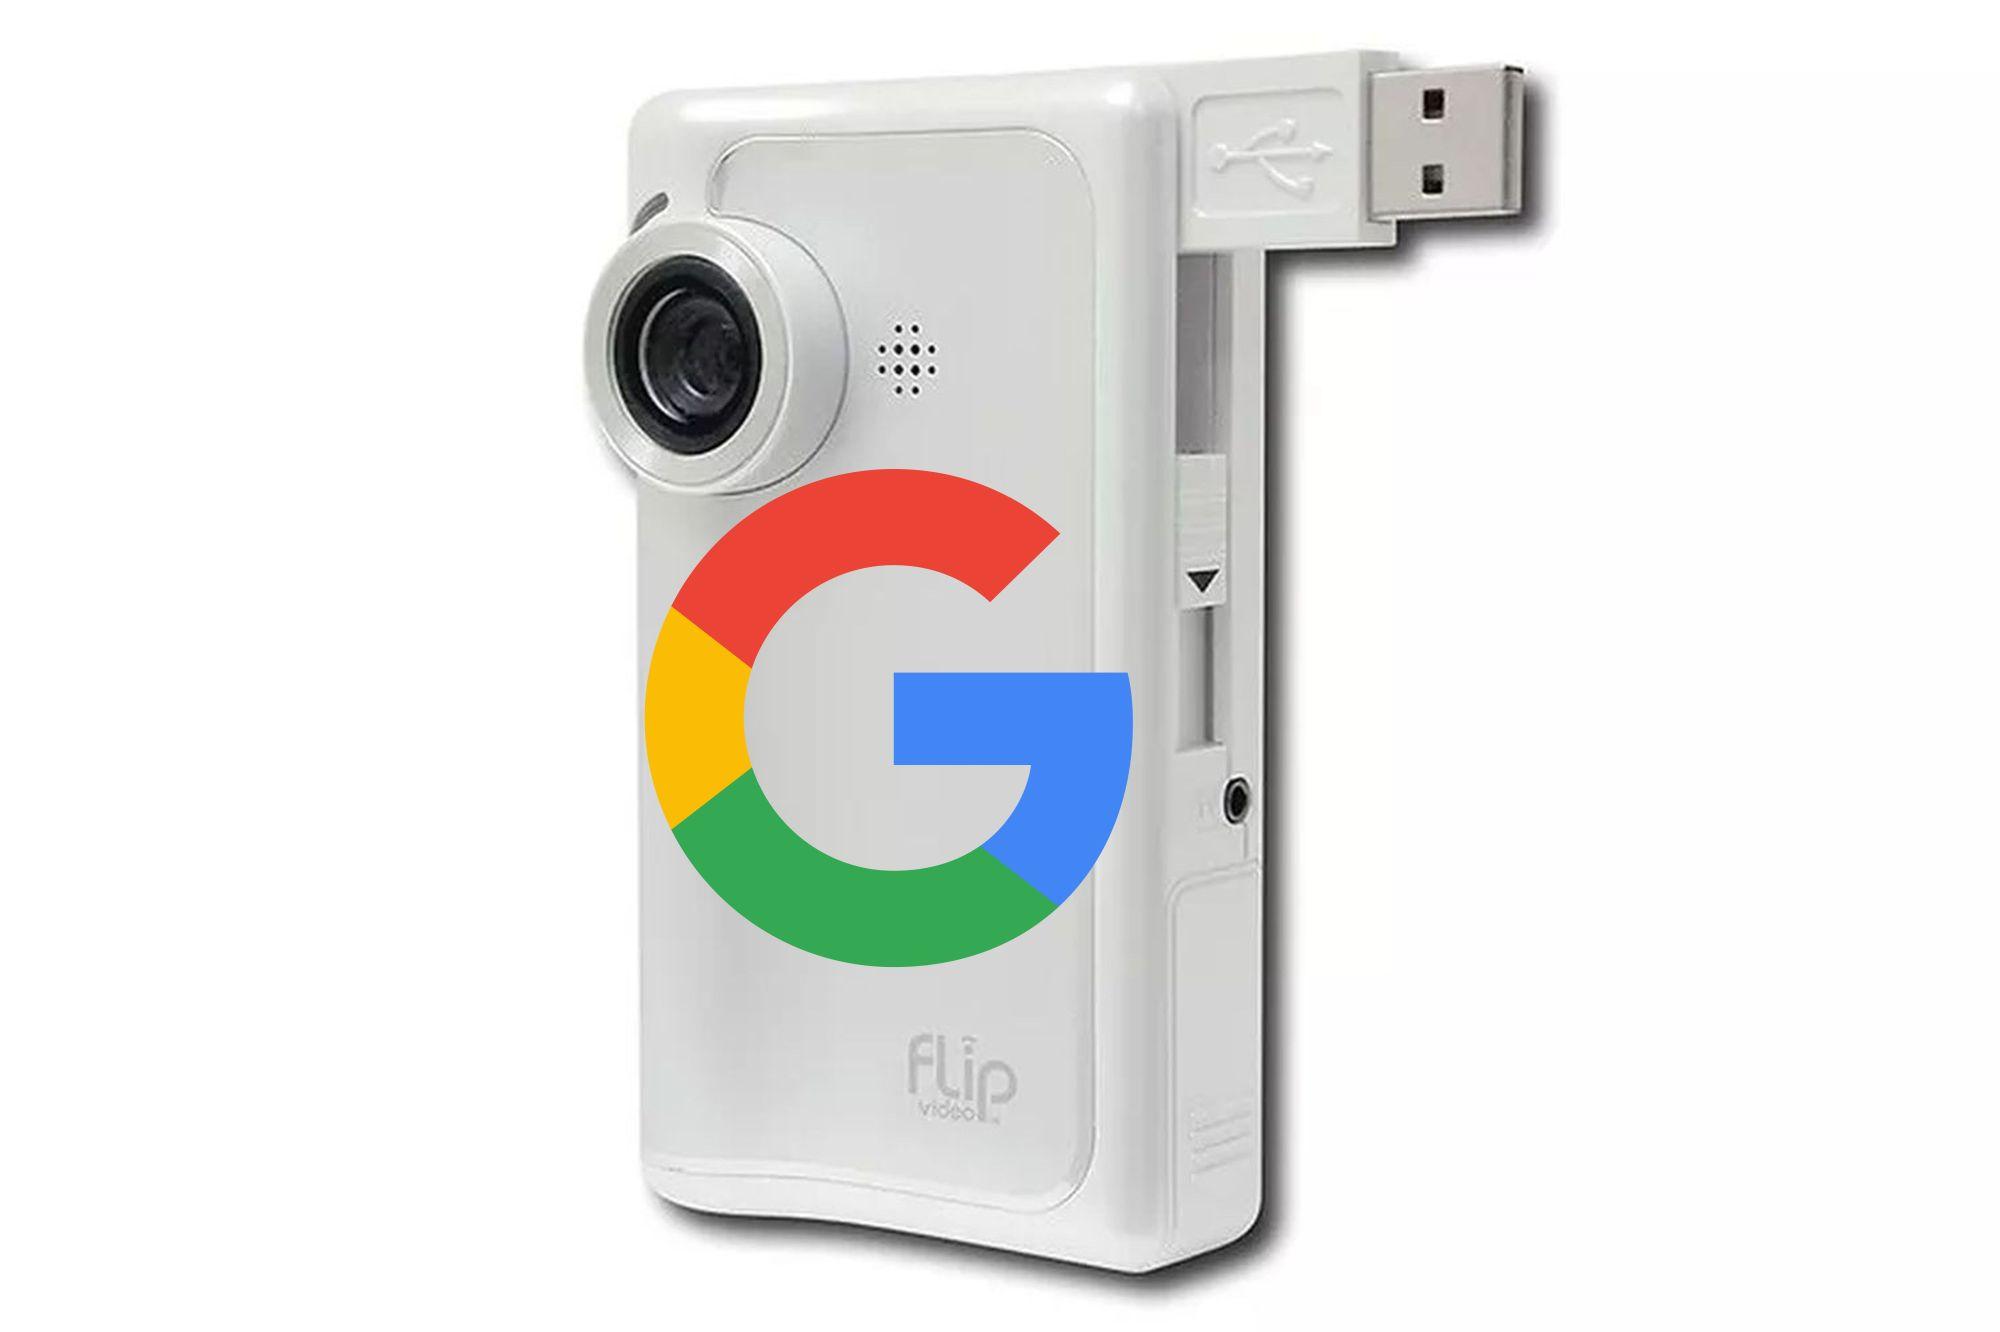 google pure digital flip video camera